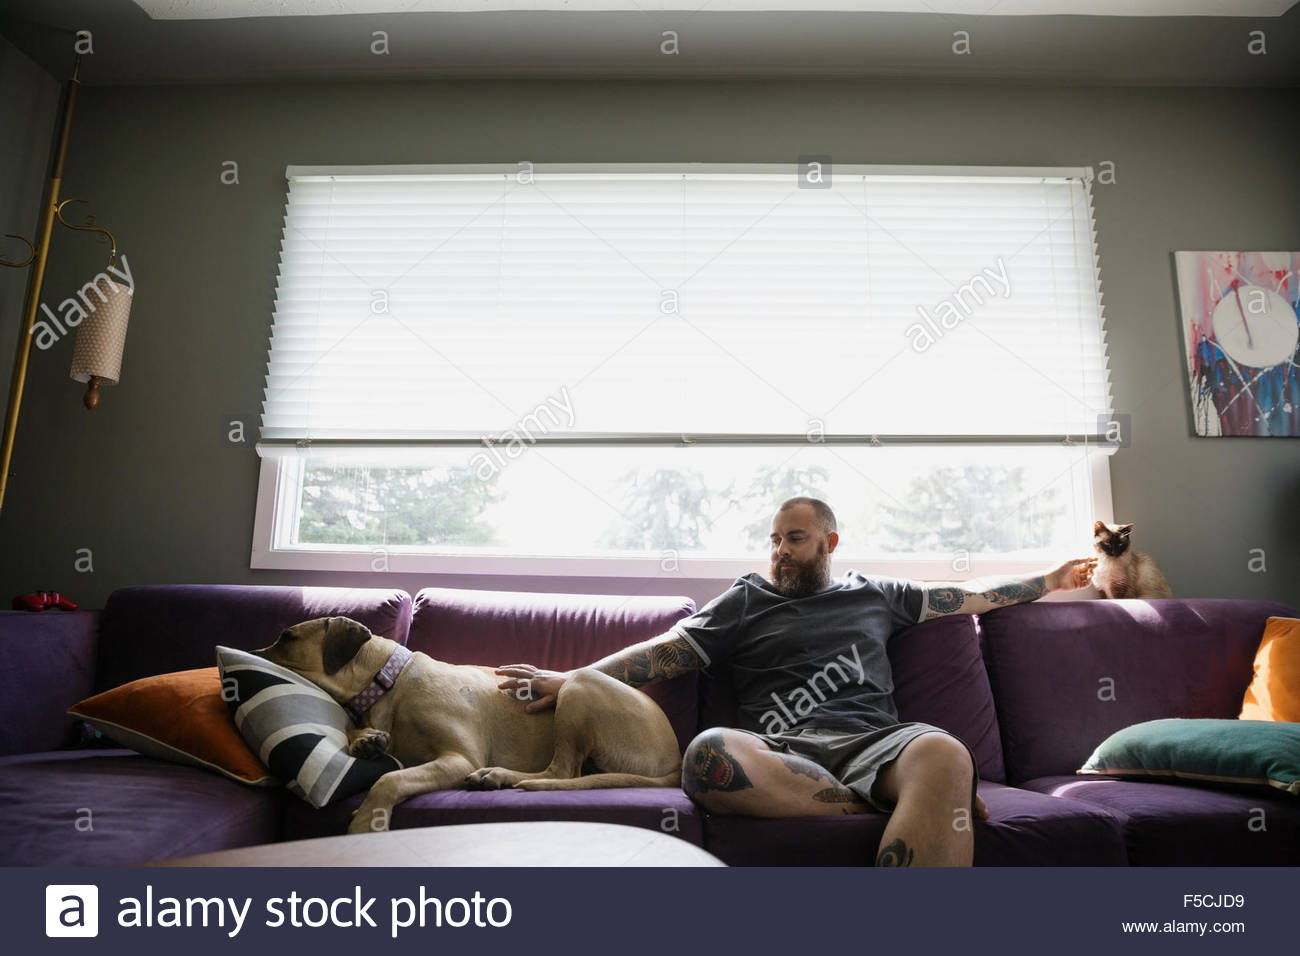 Man on sofa petting dog and cat - Stock Image